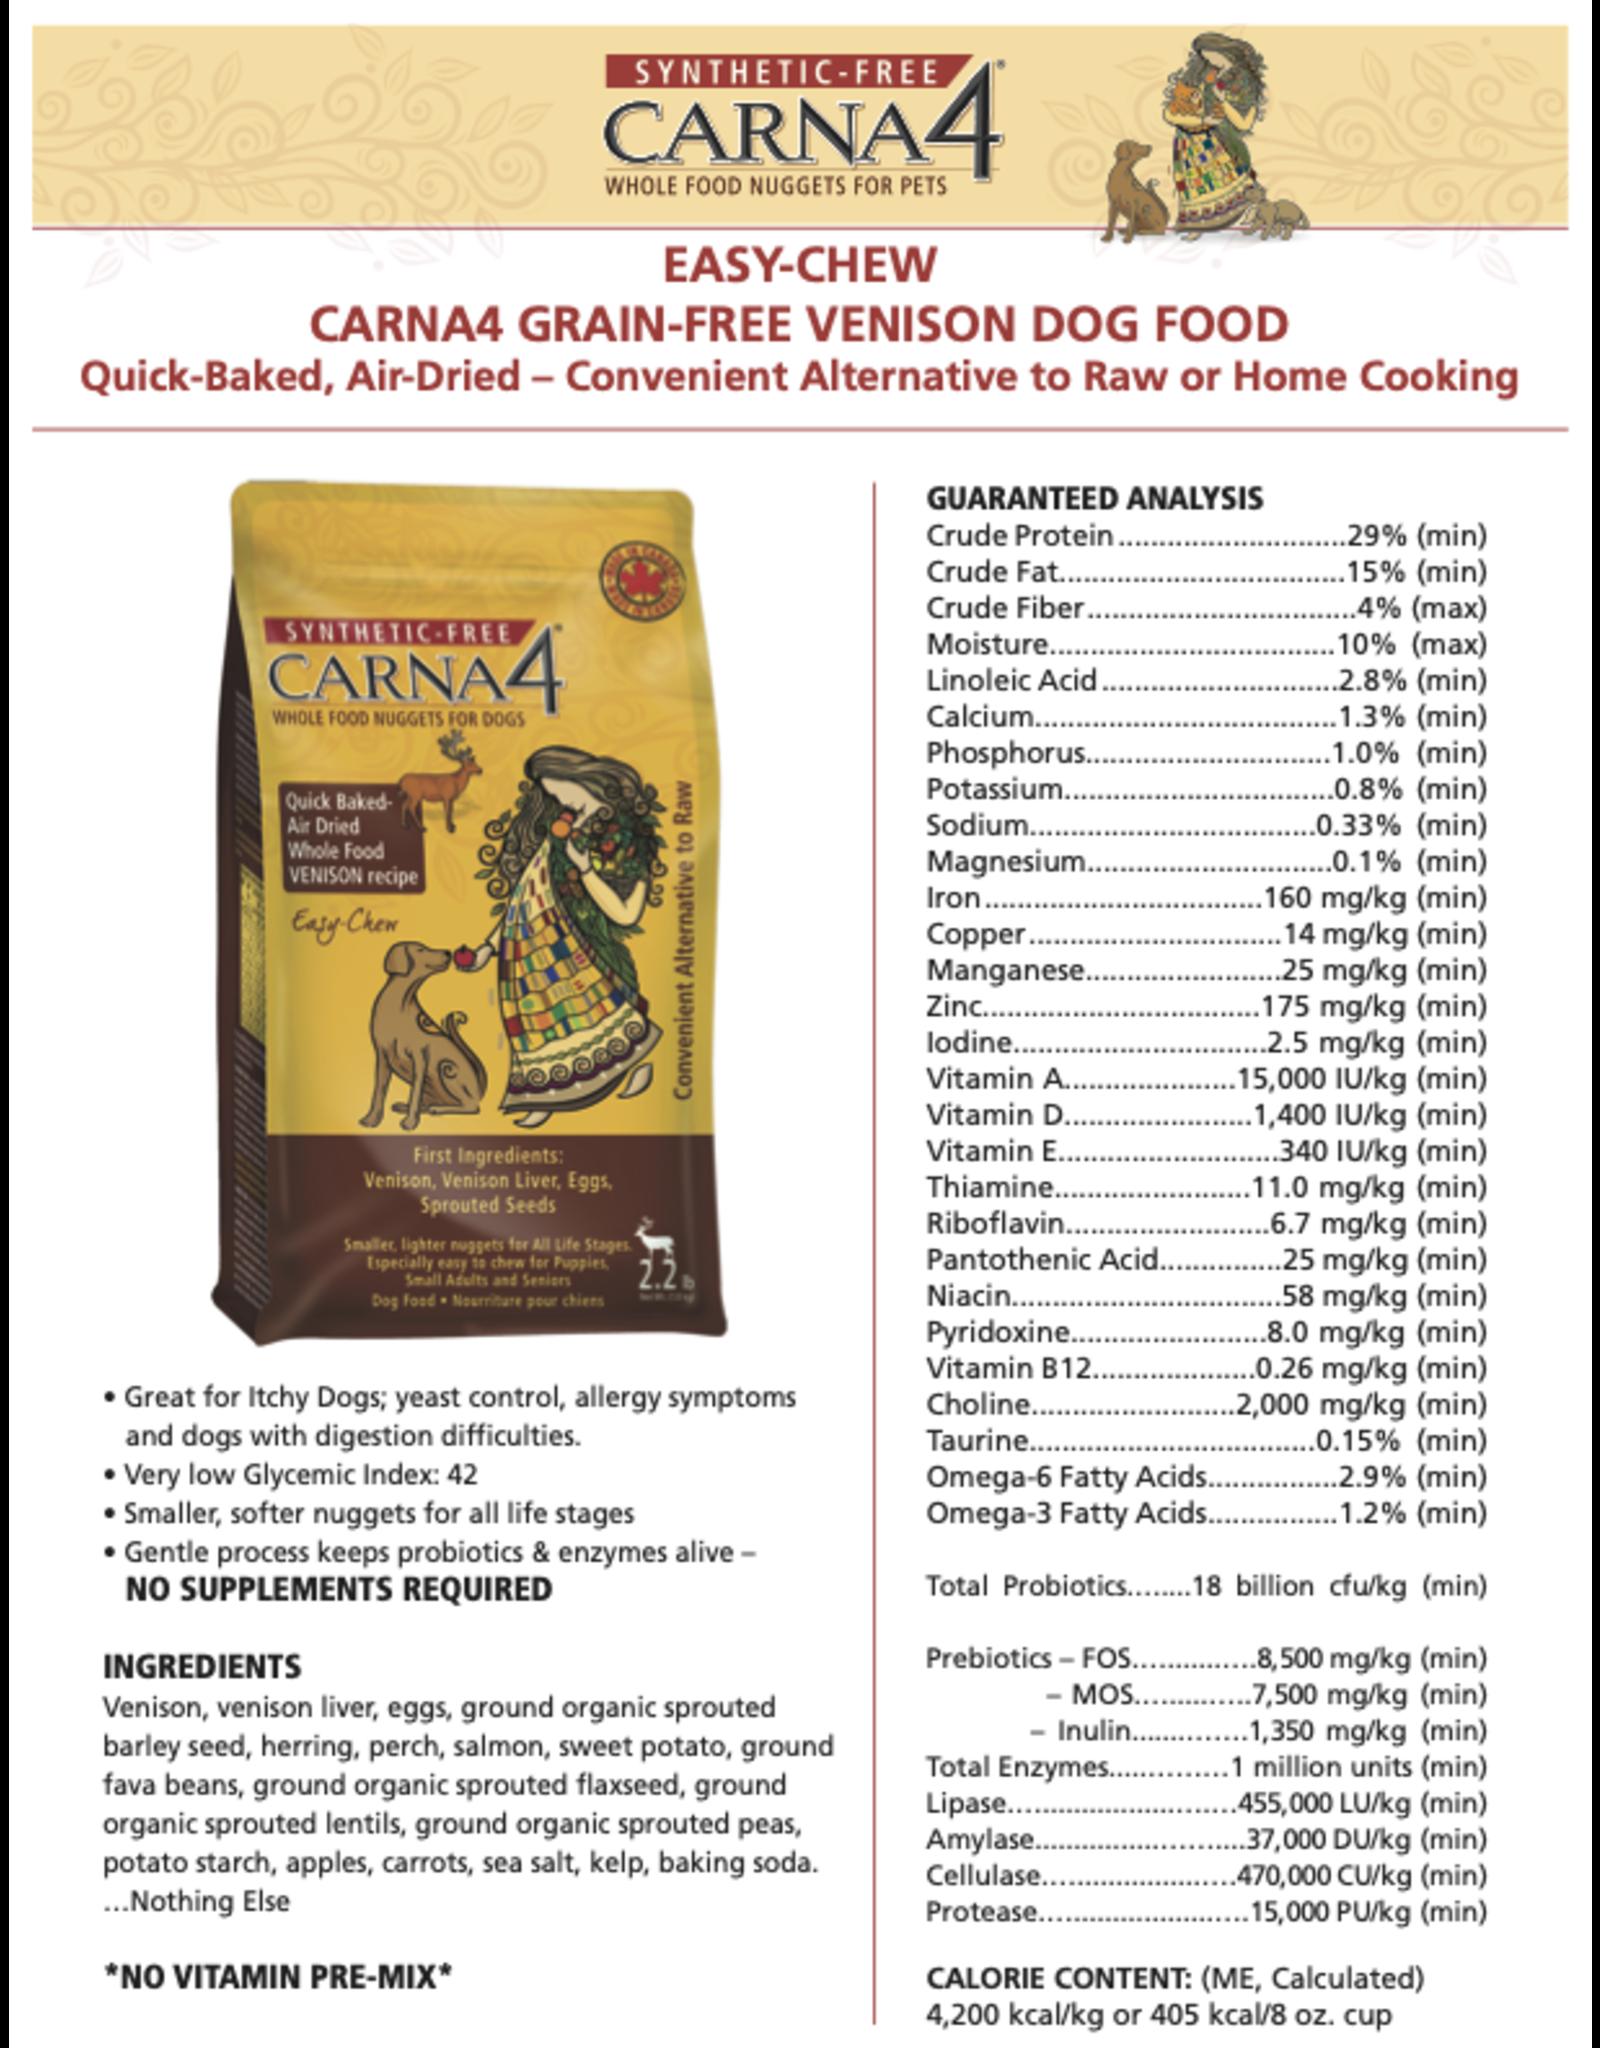 CARNA CARNA4 DOG AIR DRIED EASY-CHEW VENISON